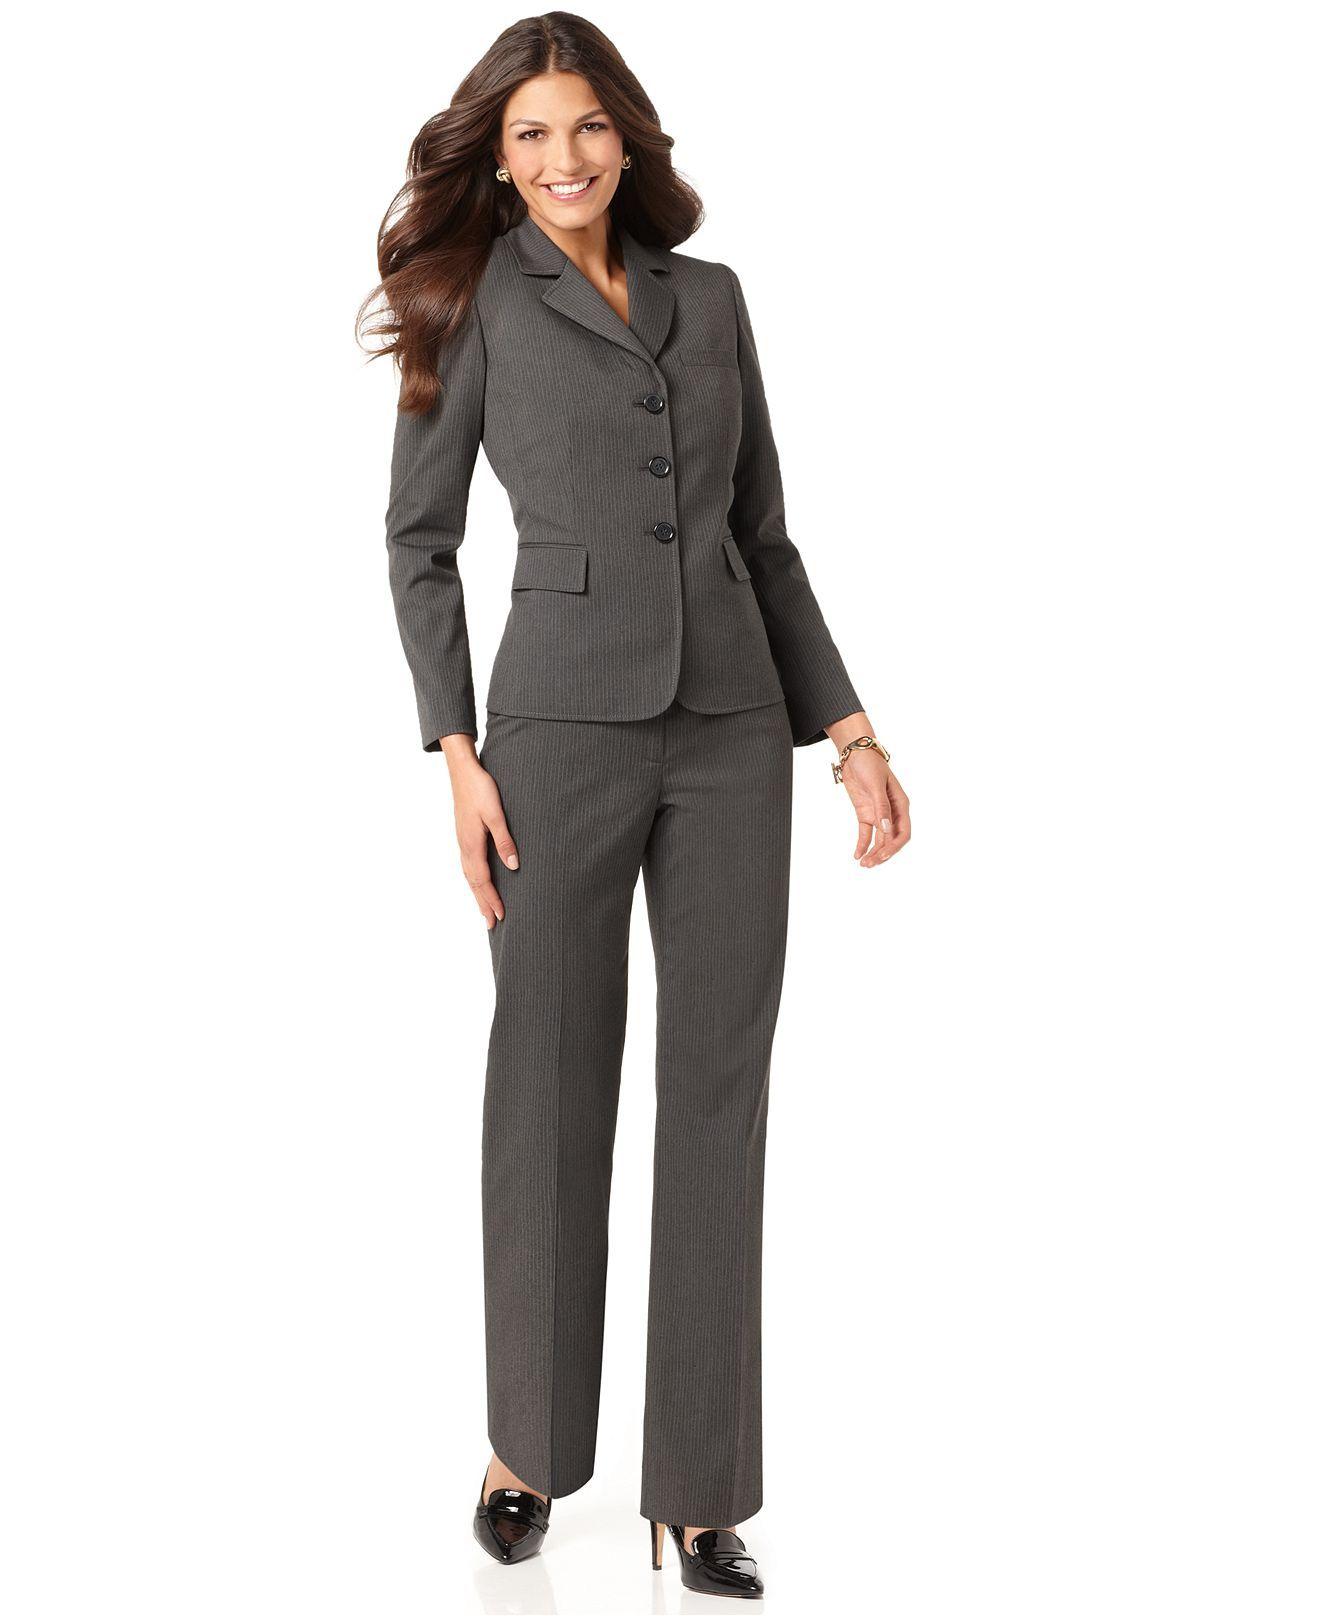 ee029f48fb Tahari by ASL Petite Suit, Long Sleeve Pinstriped Jacket & Stright Leg Pants